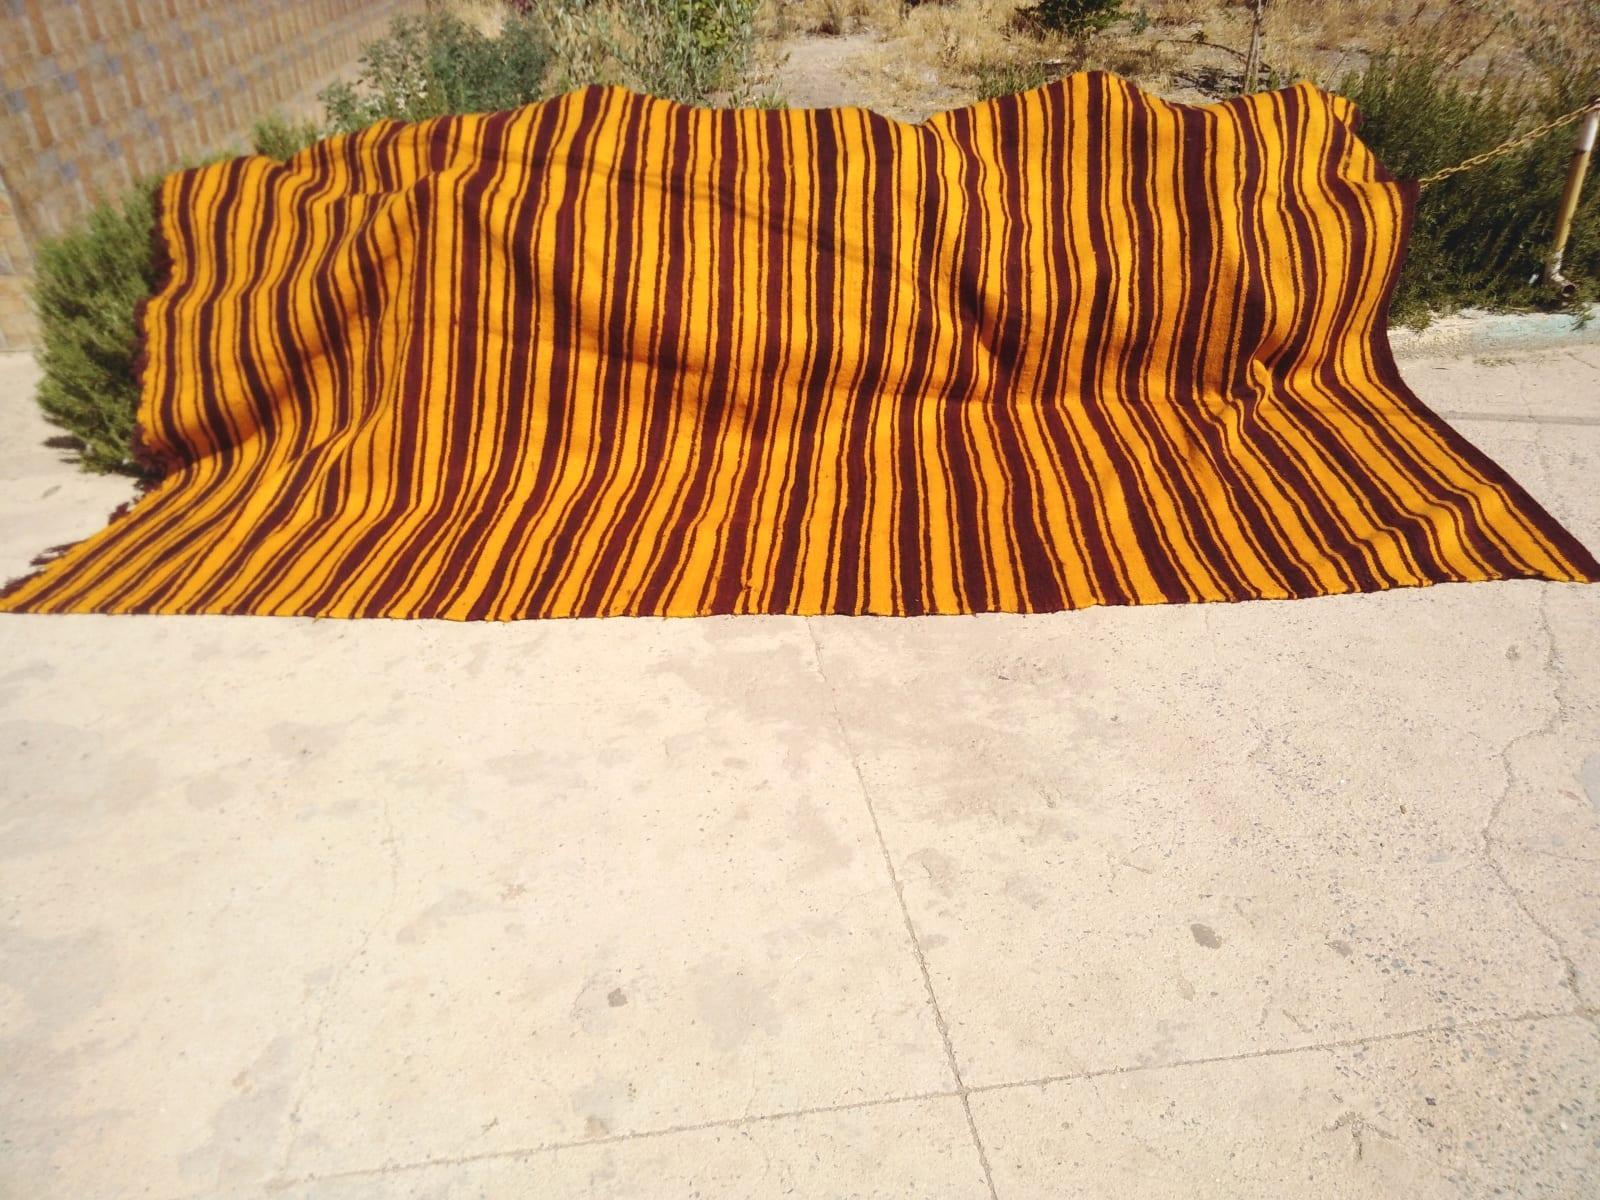 btania Kotan Red, Yellow Morocco